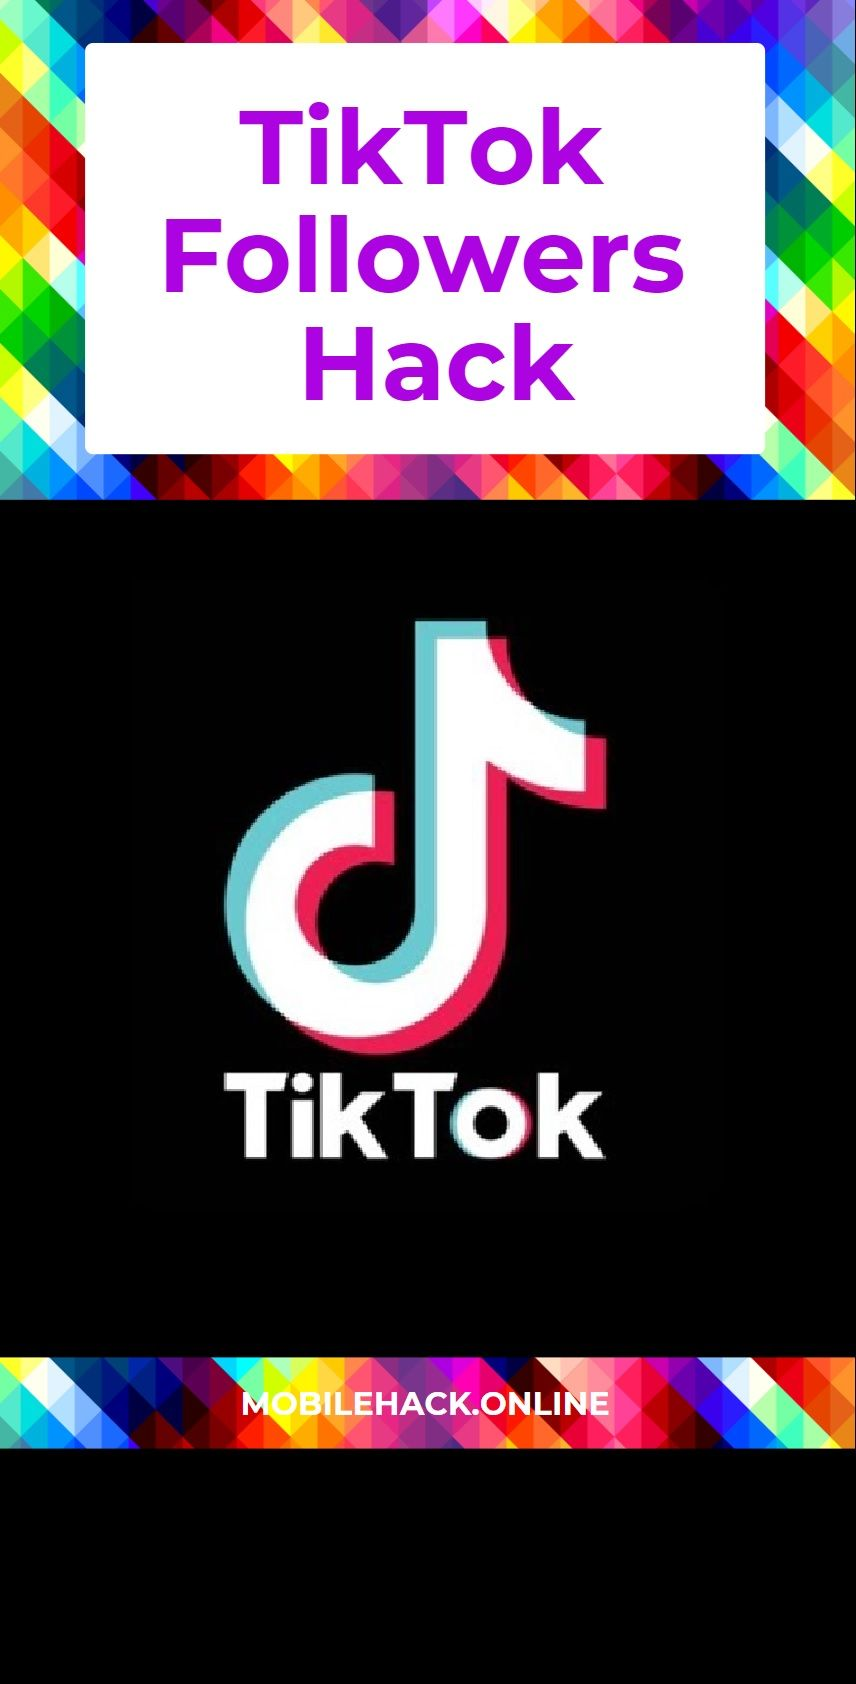 Tiktok Followers Hack How To Get Followers Free Followers Free Followers On Instagram